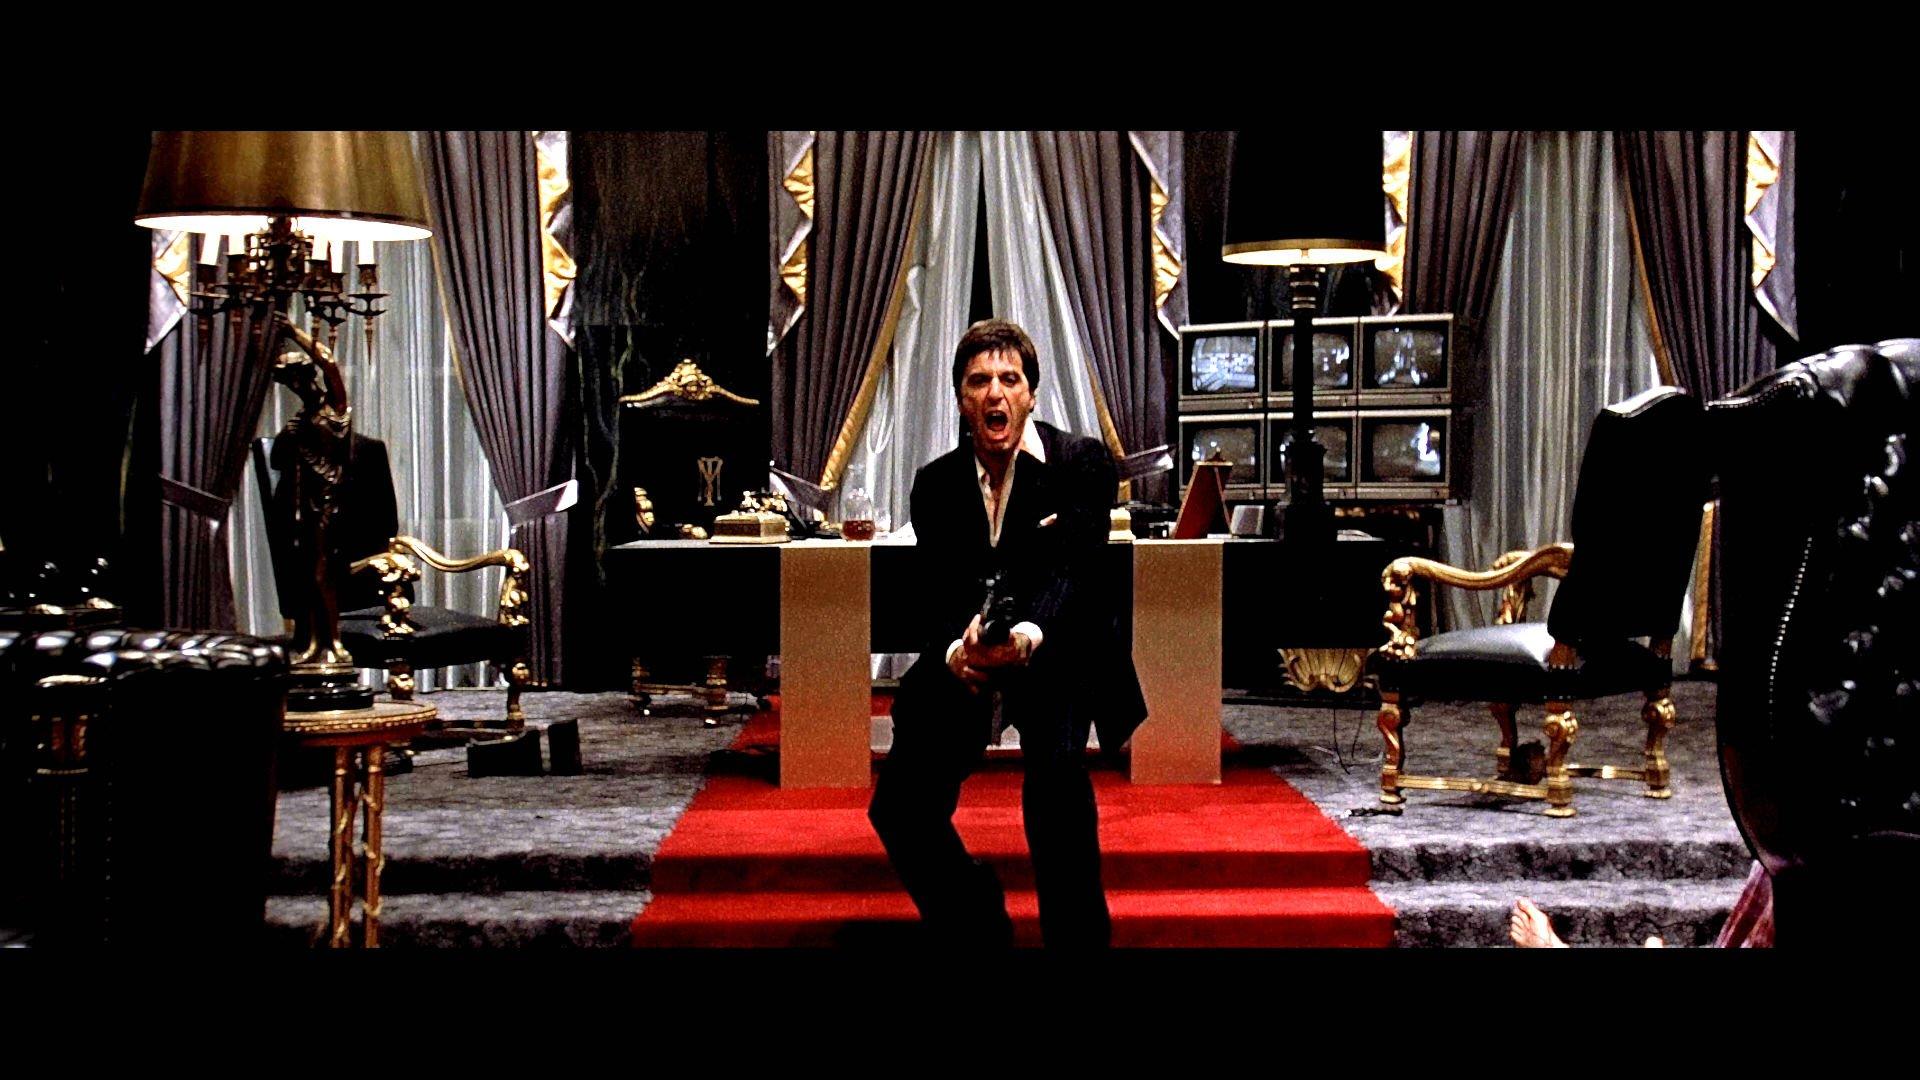 Scarface crime drama movie film battle weapon gun dark - Scarface background ...